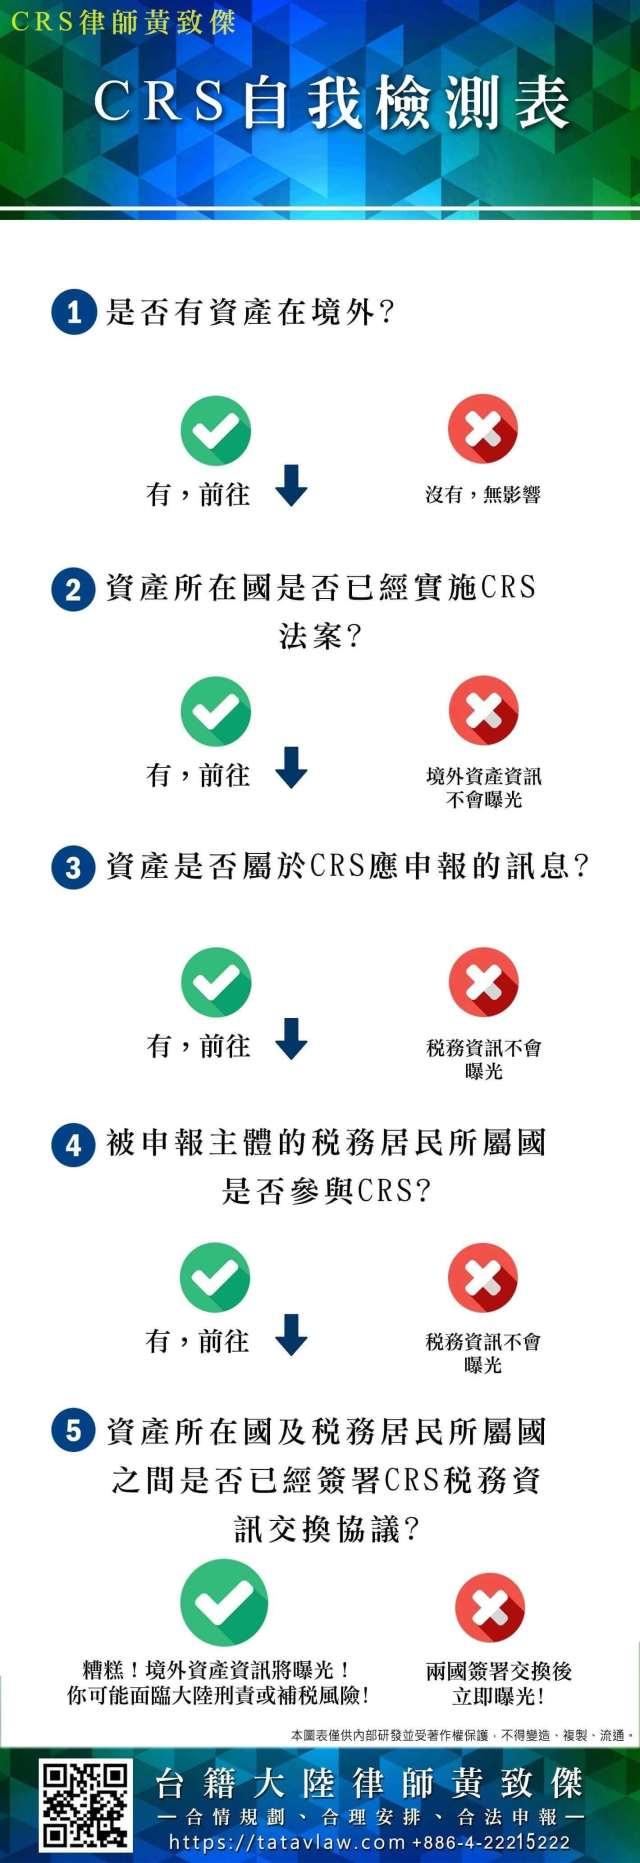 CRS自我檢測查核表B